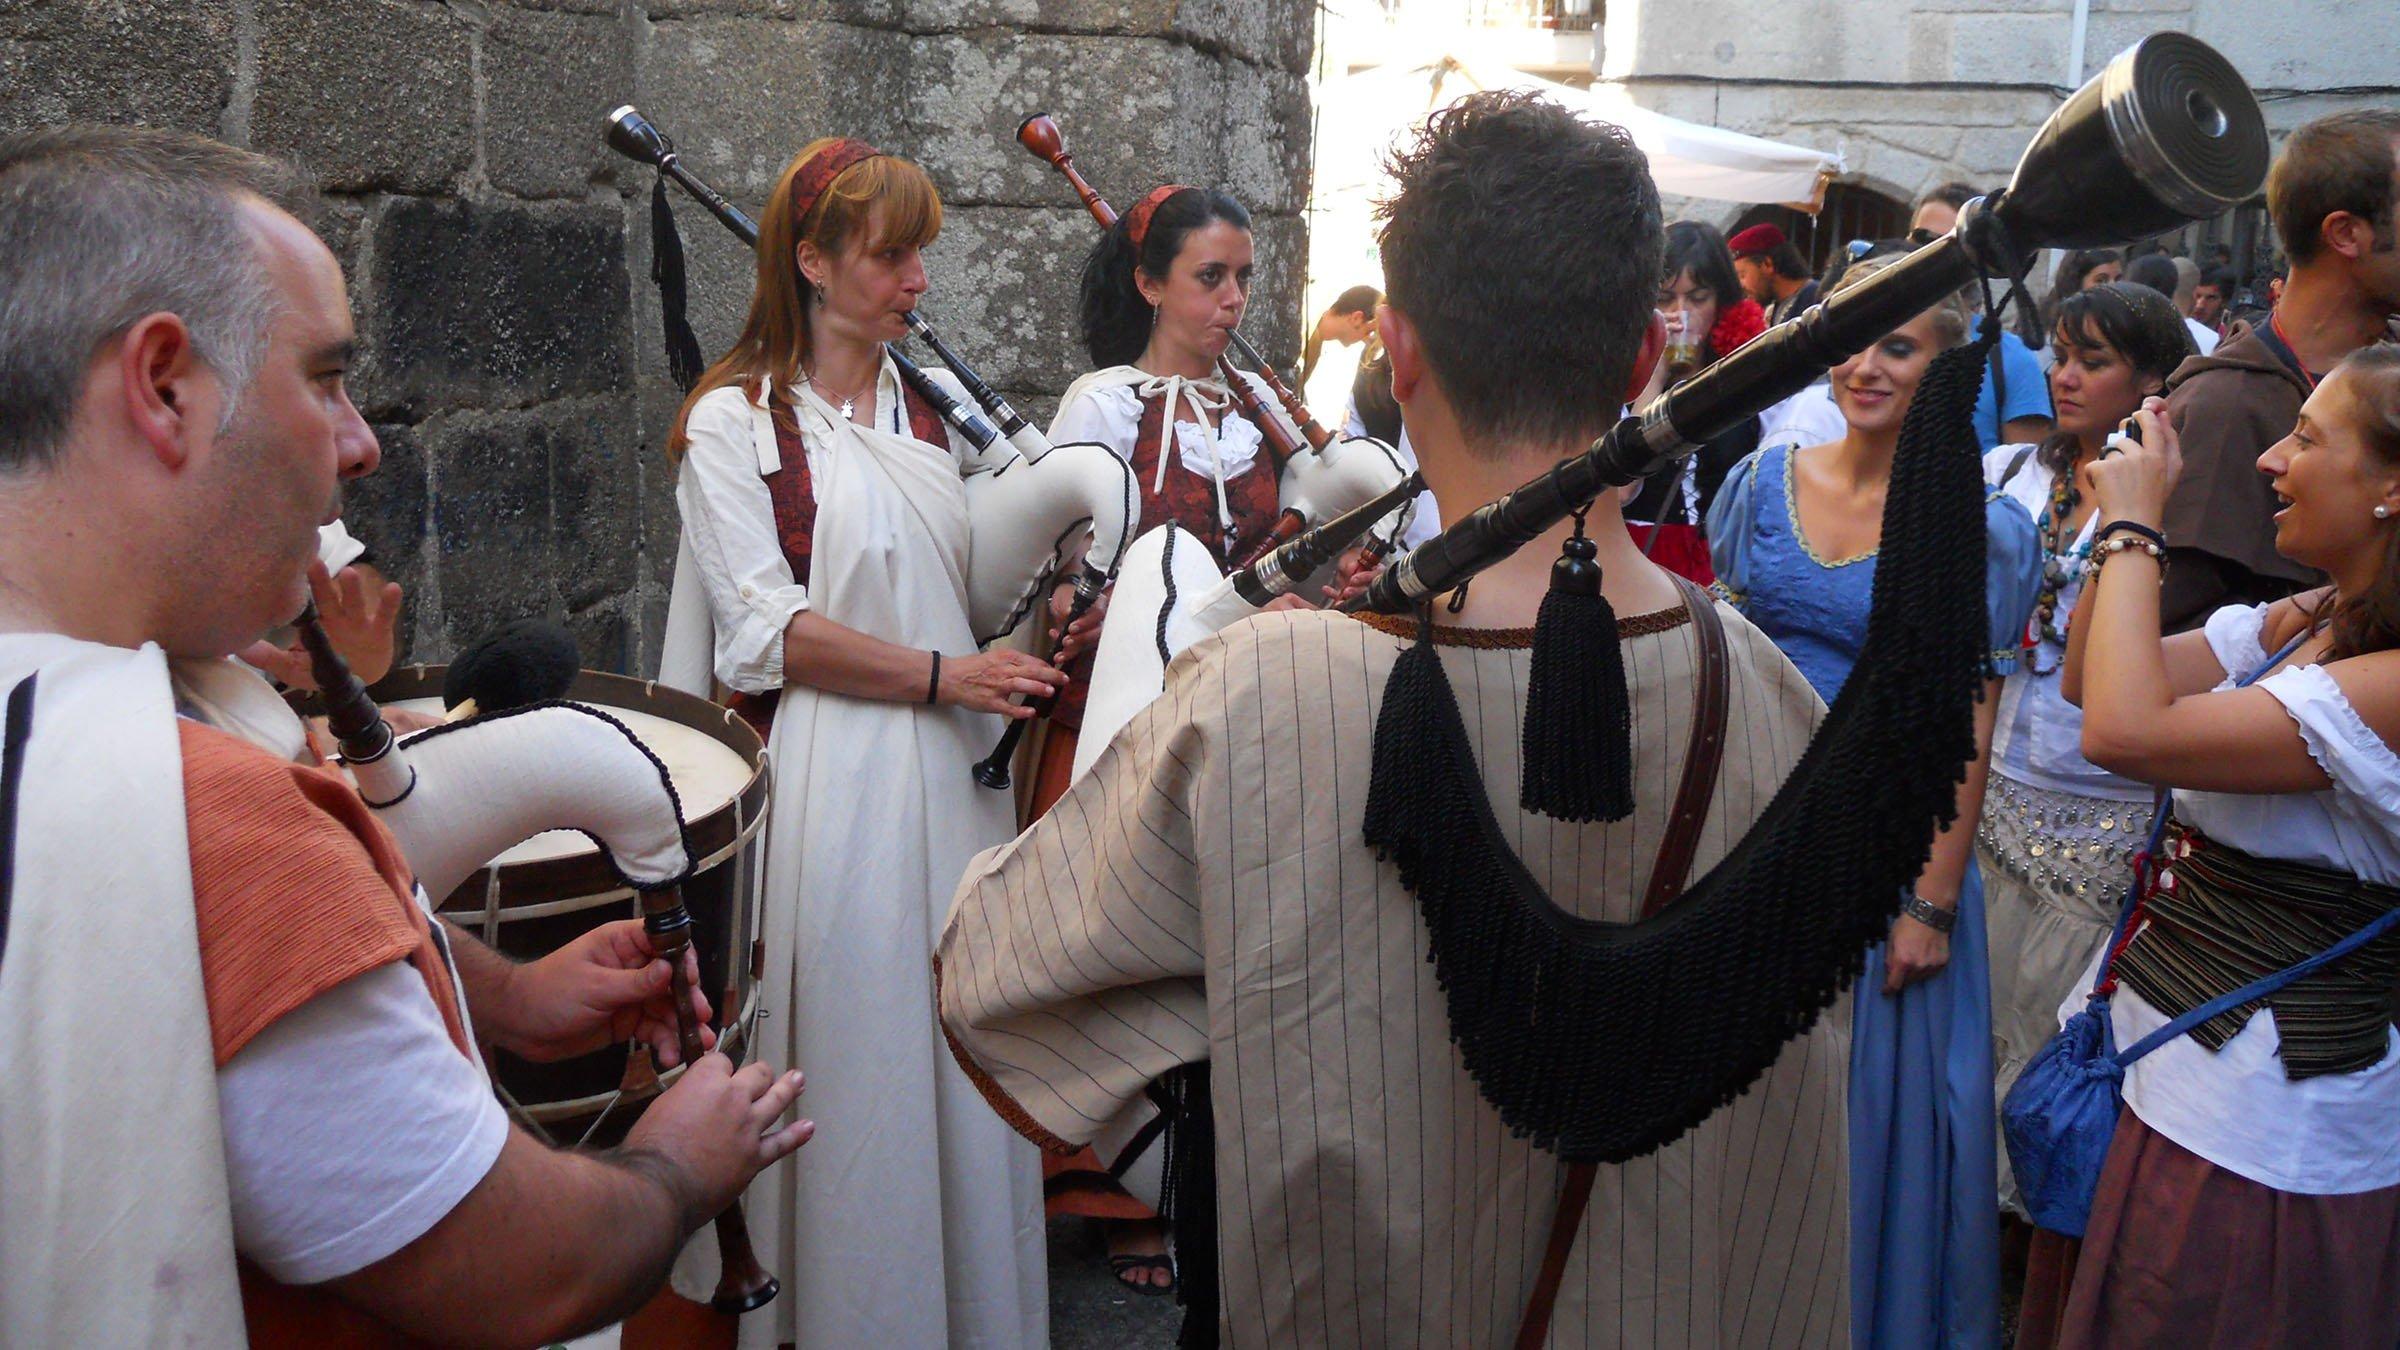 Gaiteros de Galicia